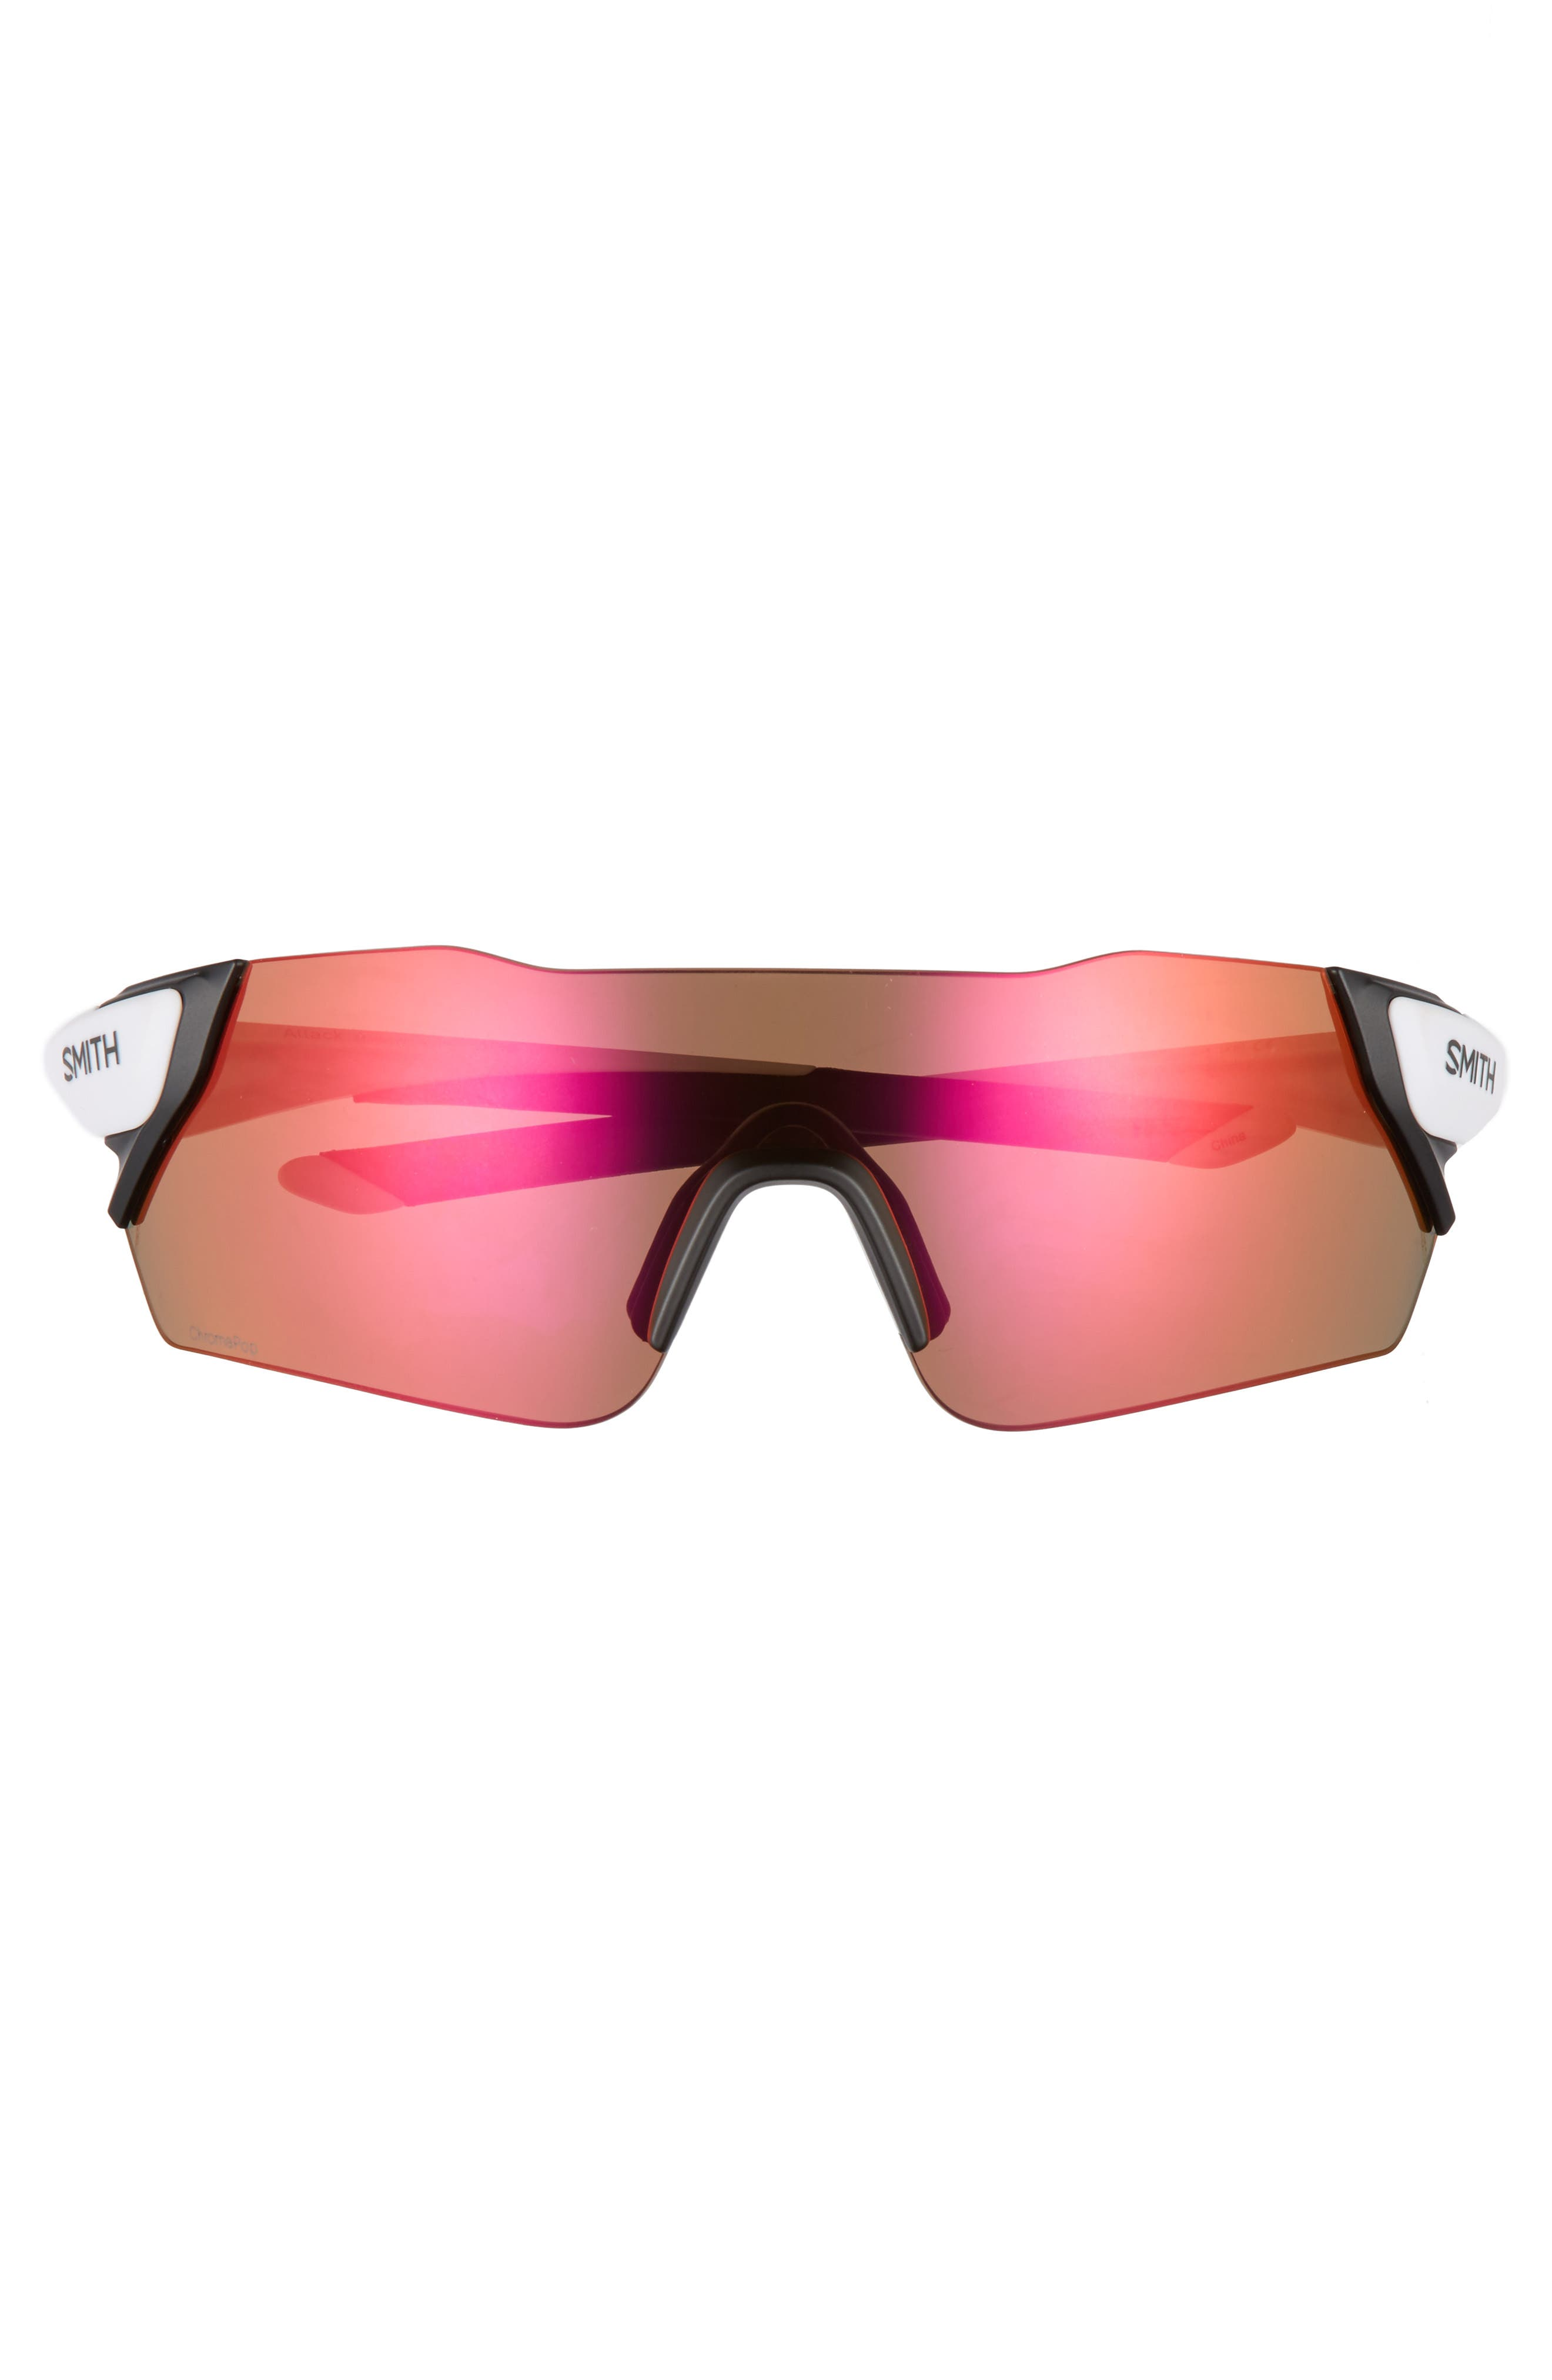 Alternate Image 3  - Smith Attack 125mm ChromaPop™ Polarized Shield Sunglasses